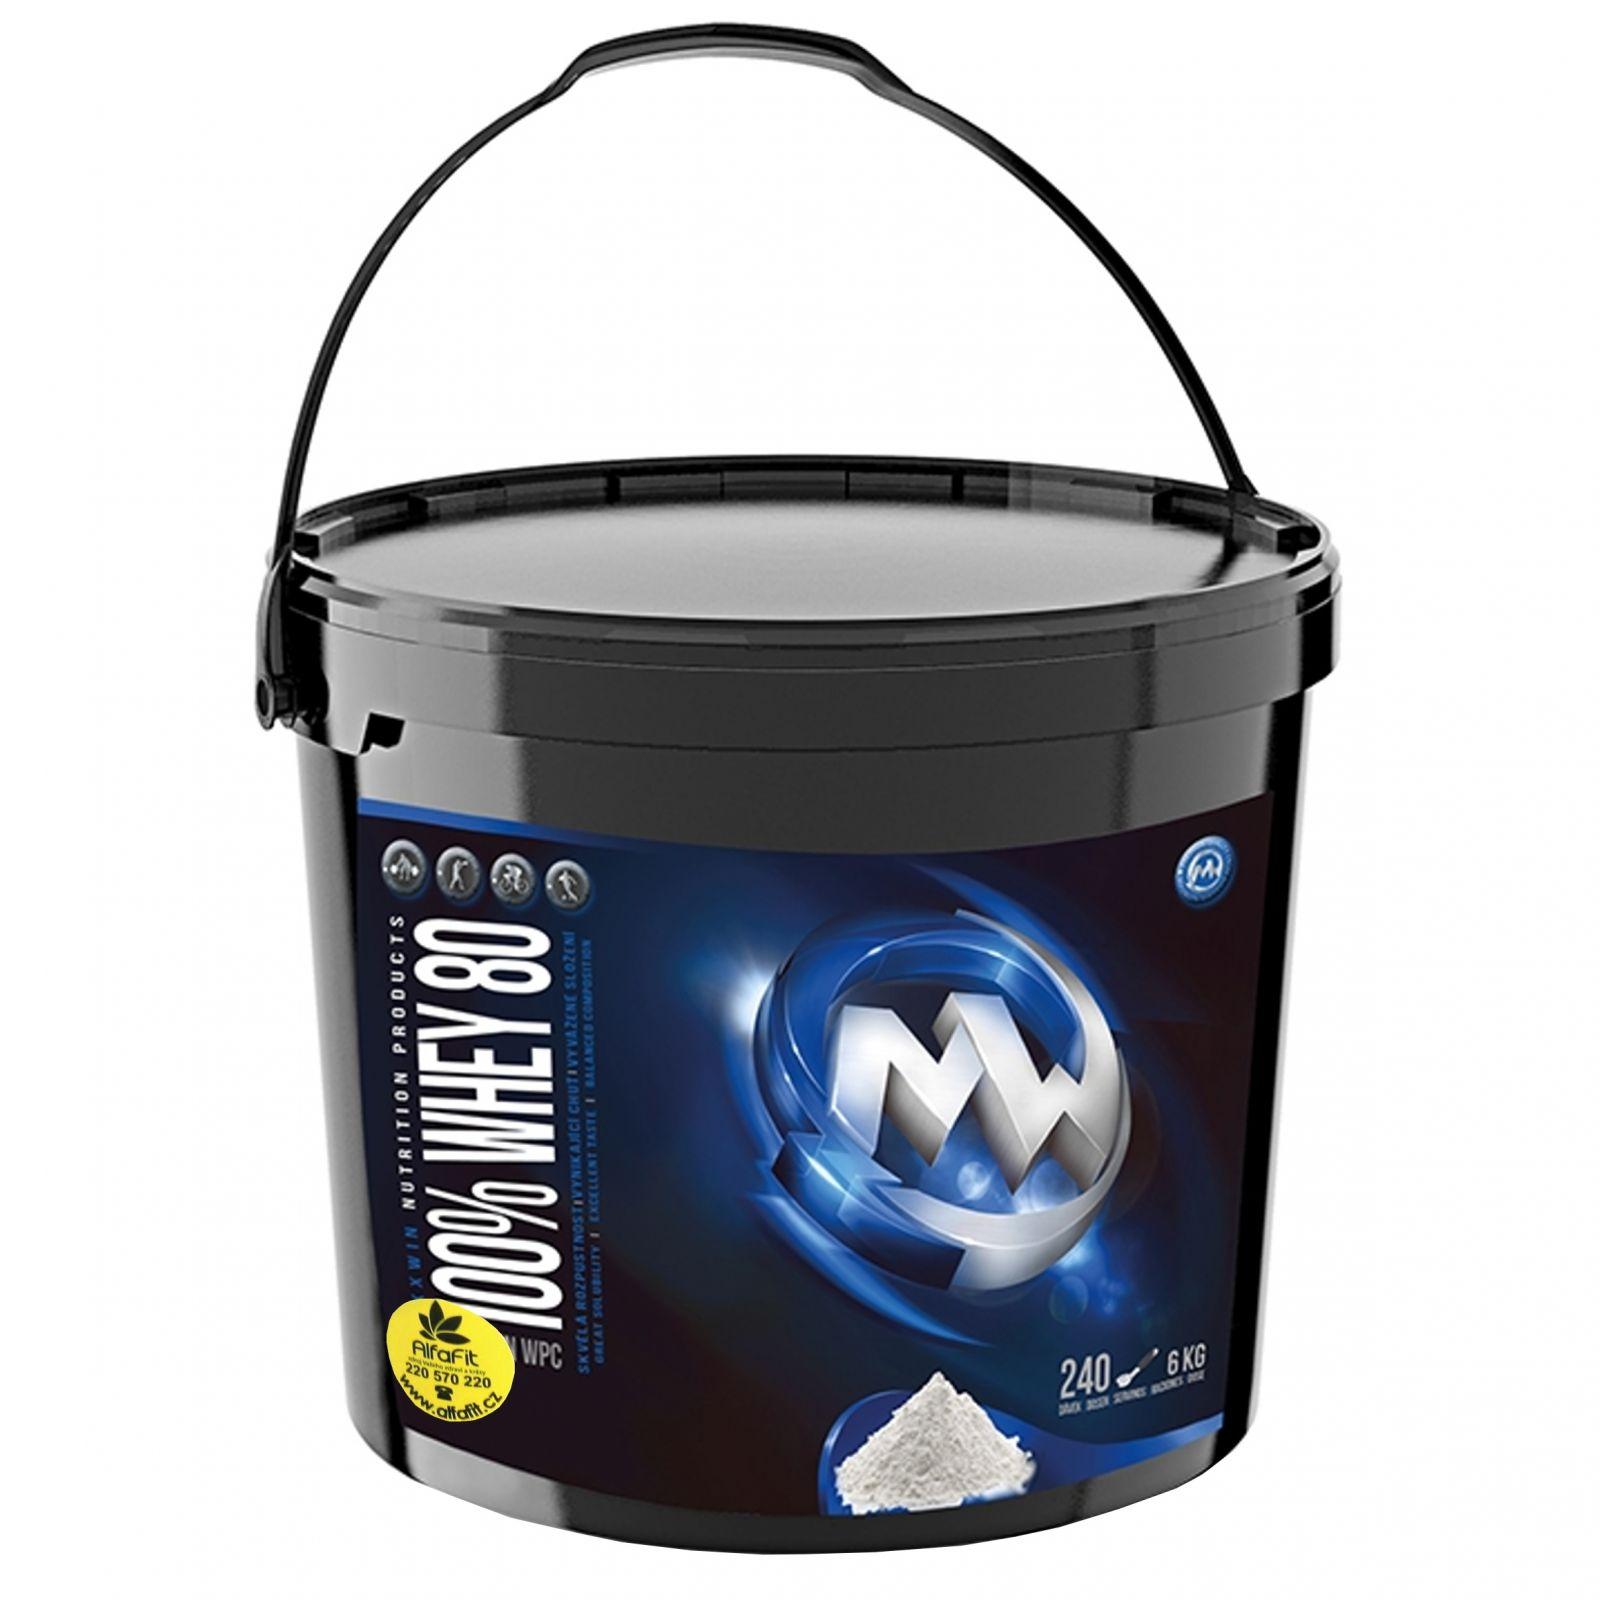 MAXXWIN 100% Whey 80 - 6000 g